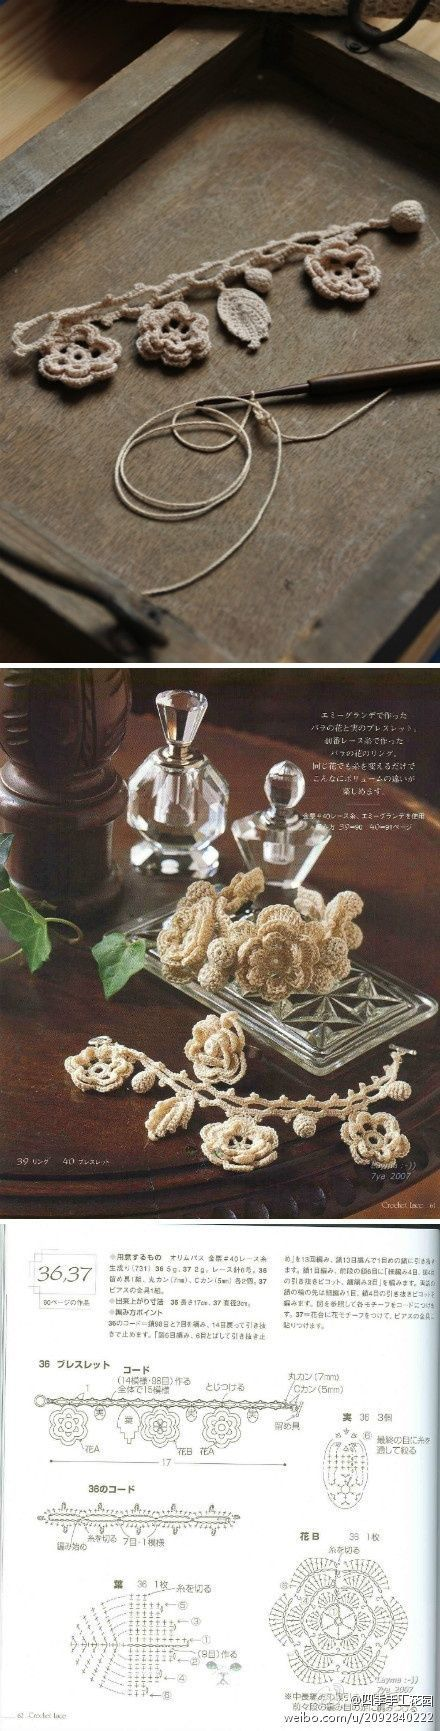 Irish Crochet Bracelet 編み物のブレスレット|わさびアイスクリーム